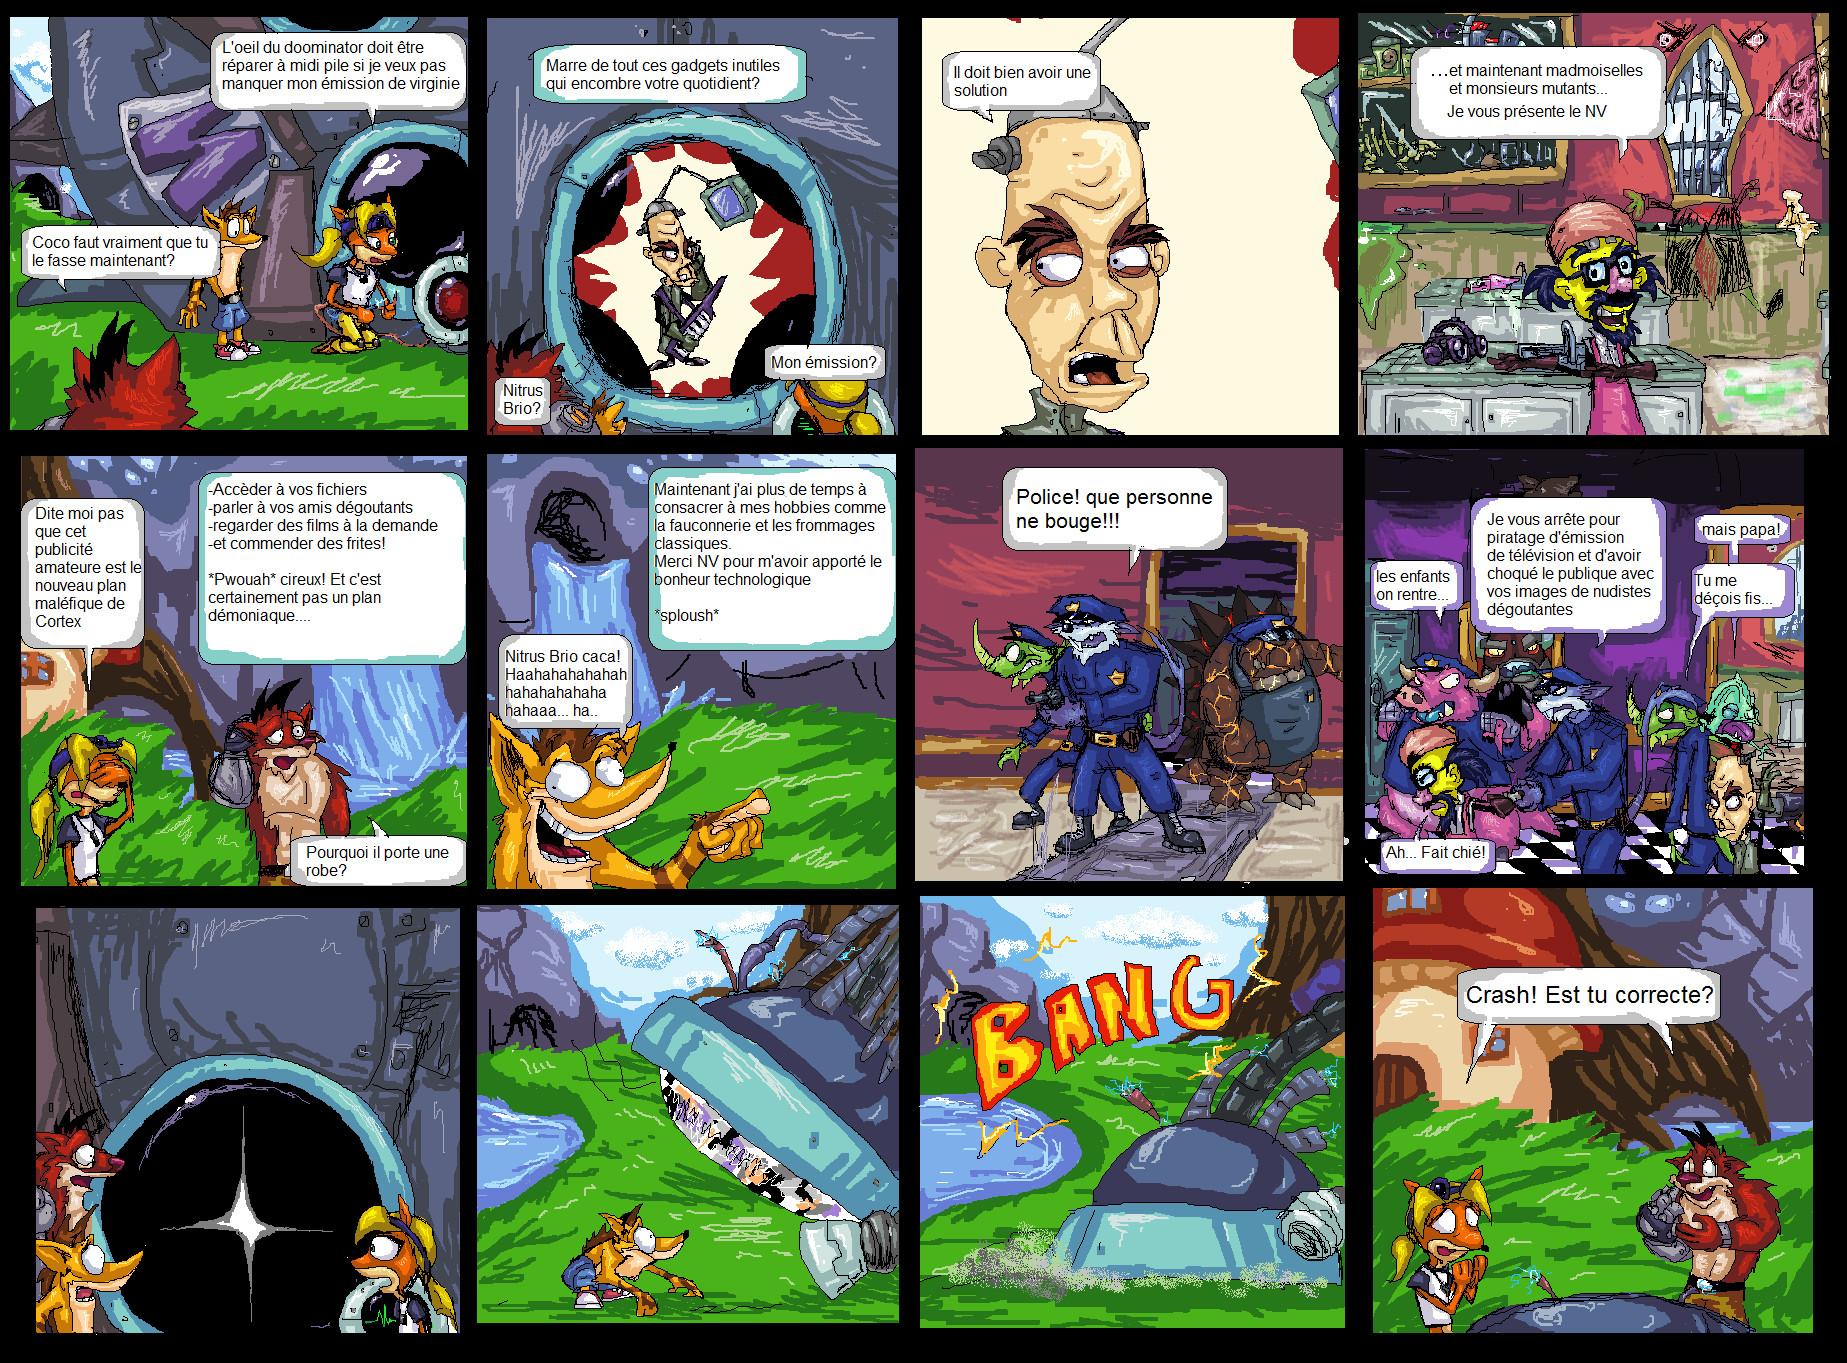 Crash generation mutant remake by NitendoFan92